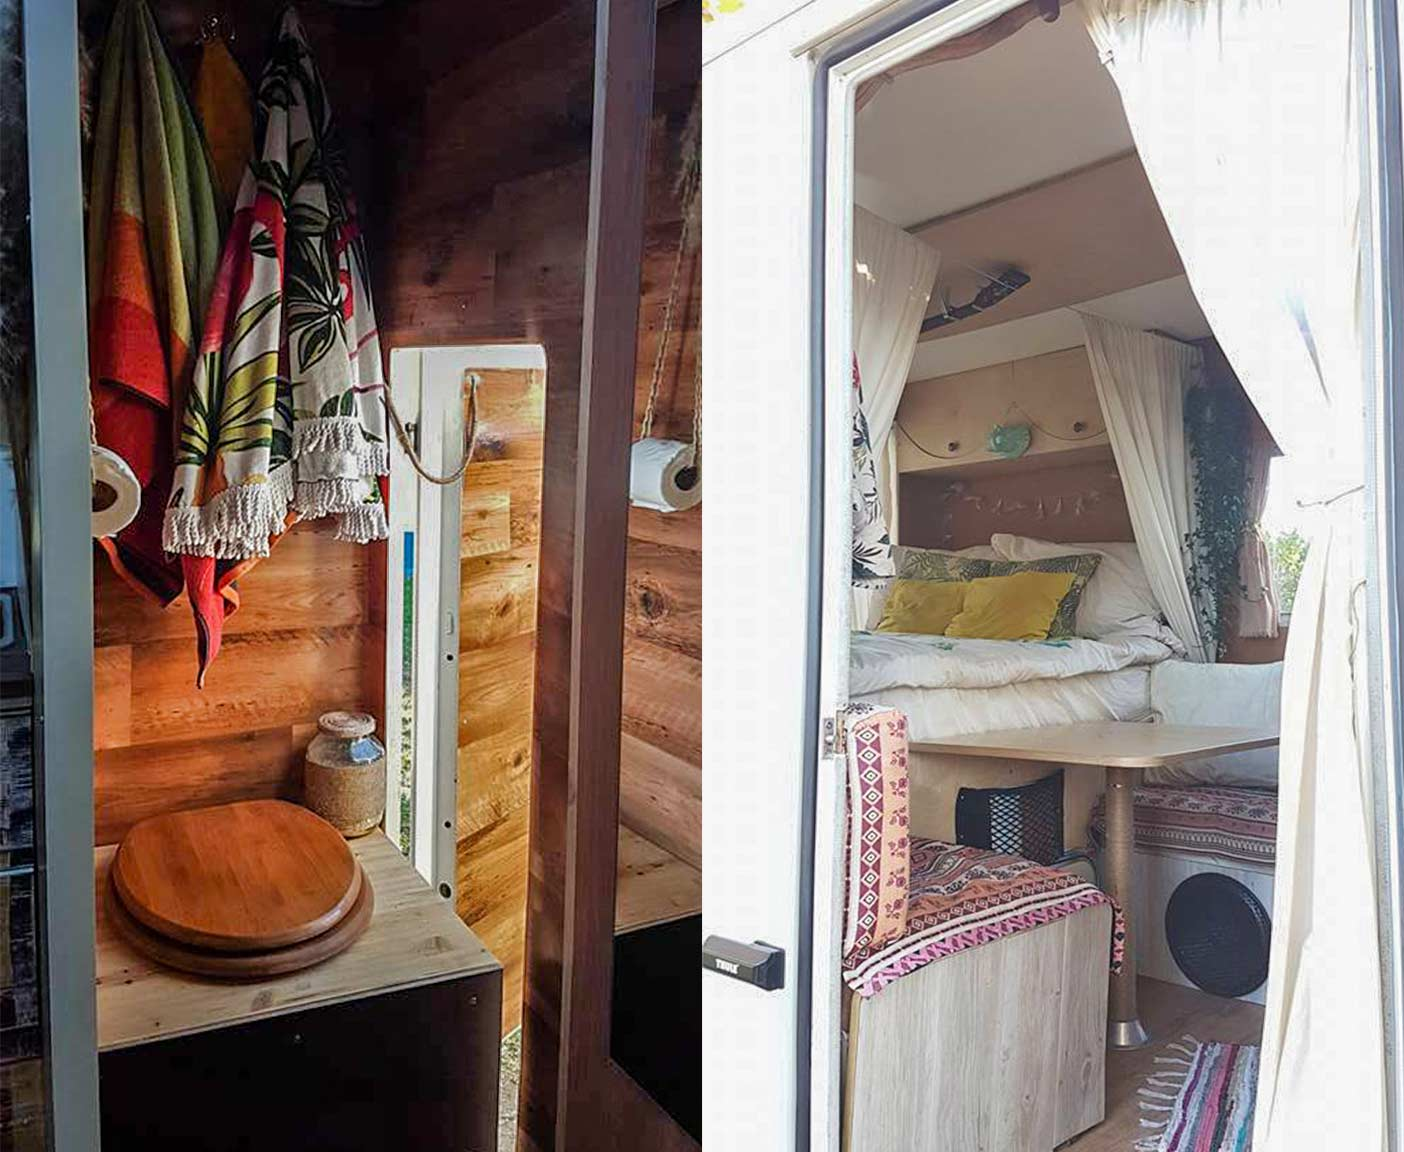 sprinter-mercedes-selbstausbau-wohnmobil-van-camper-campingbus-7